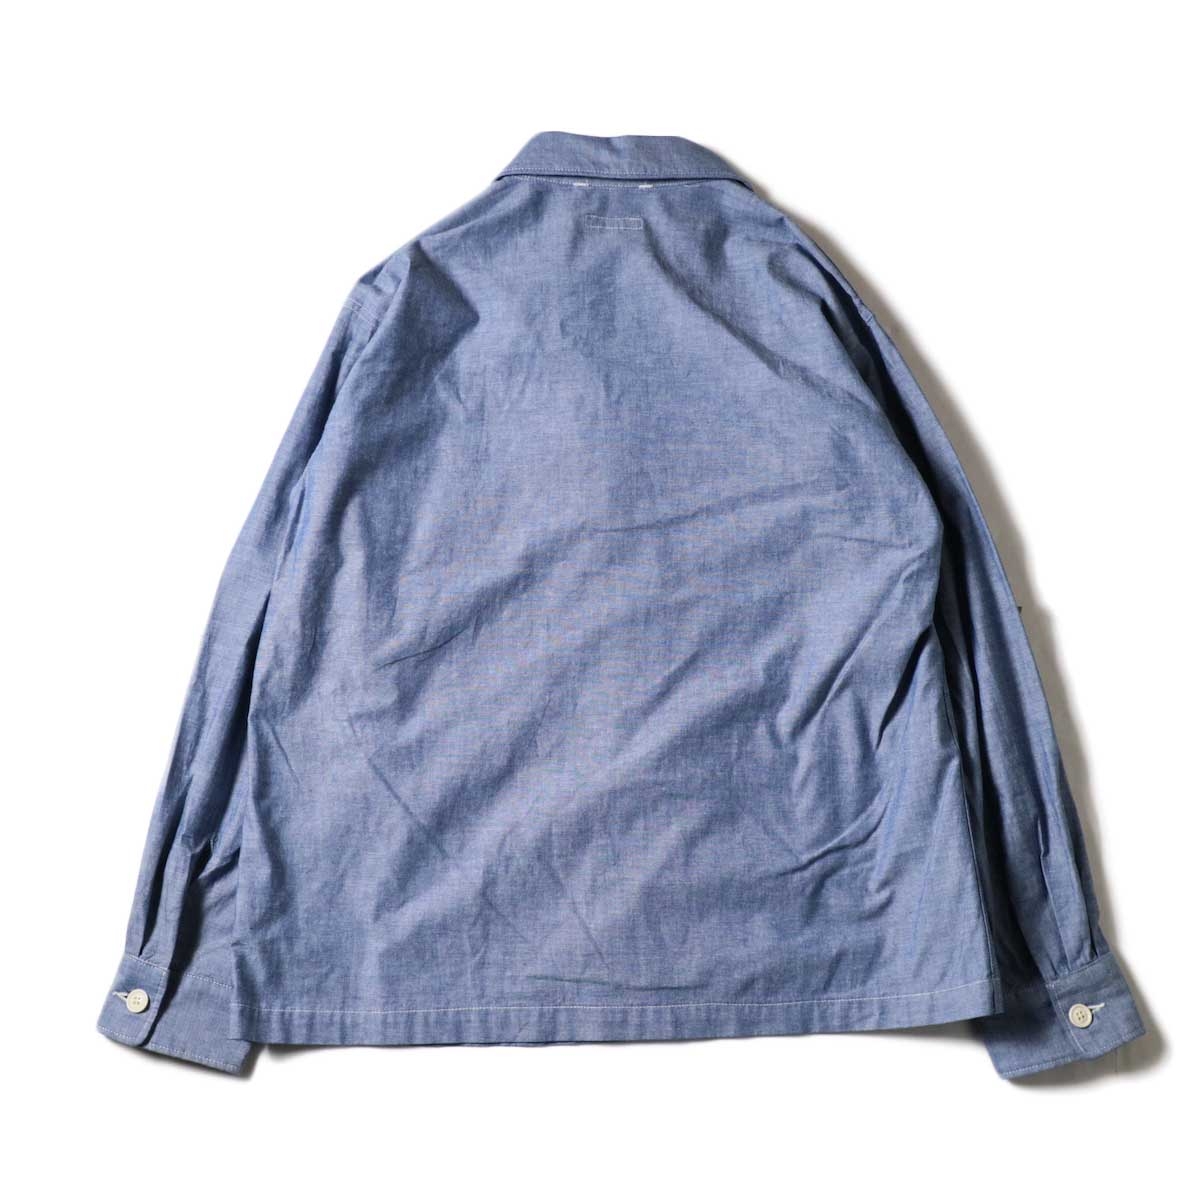 Engineered Garments / MC Shirt Jacket -Cotton Chambray (Blue)背面